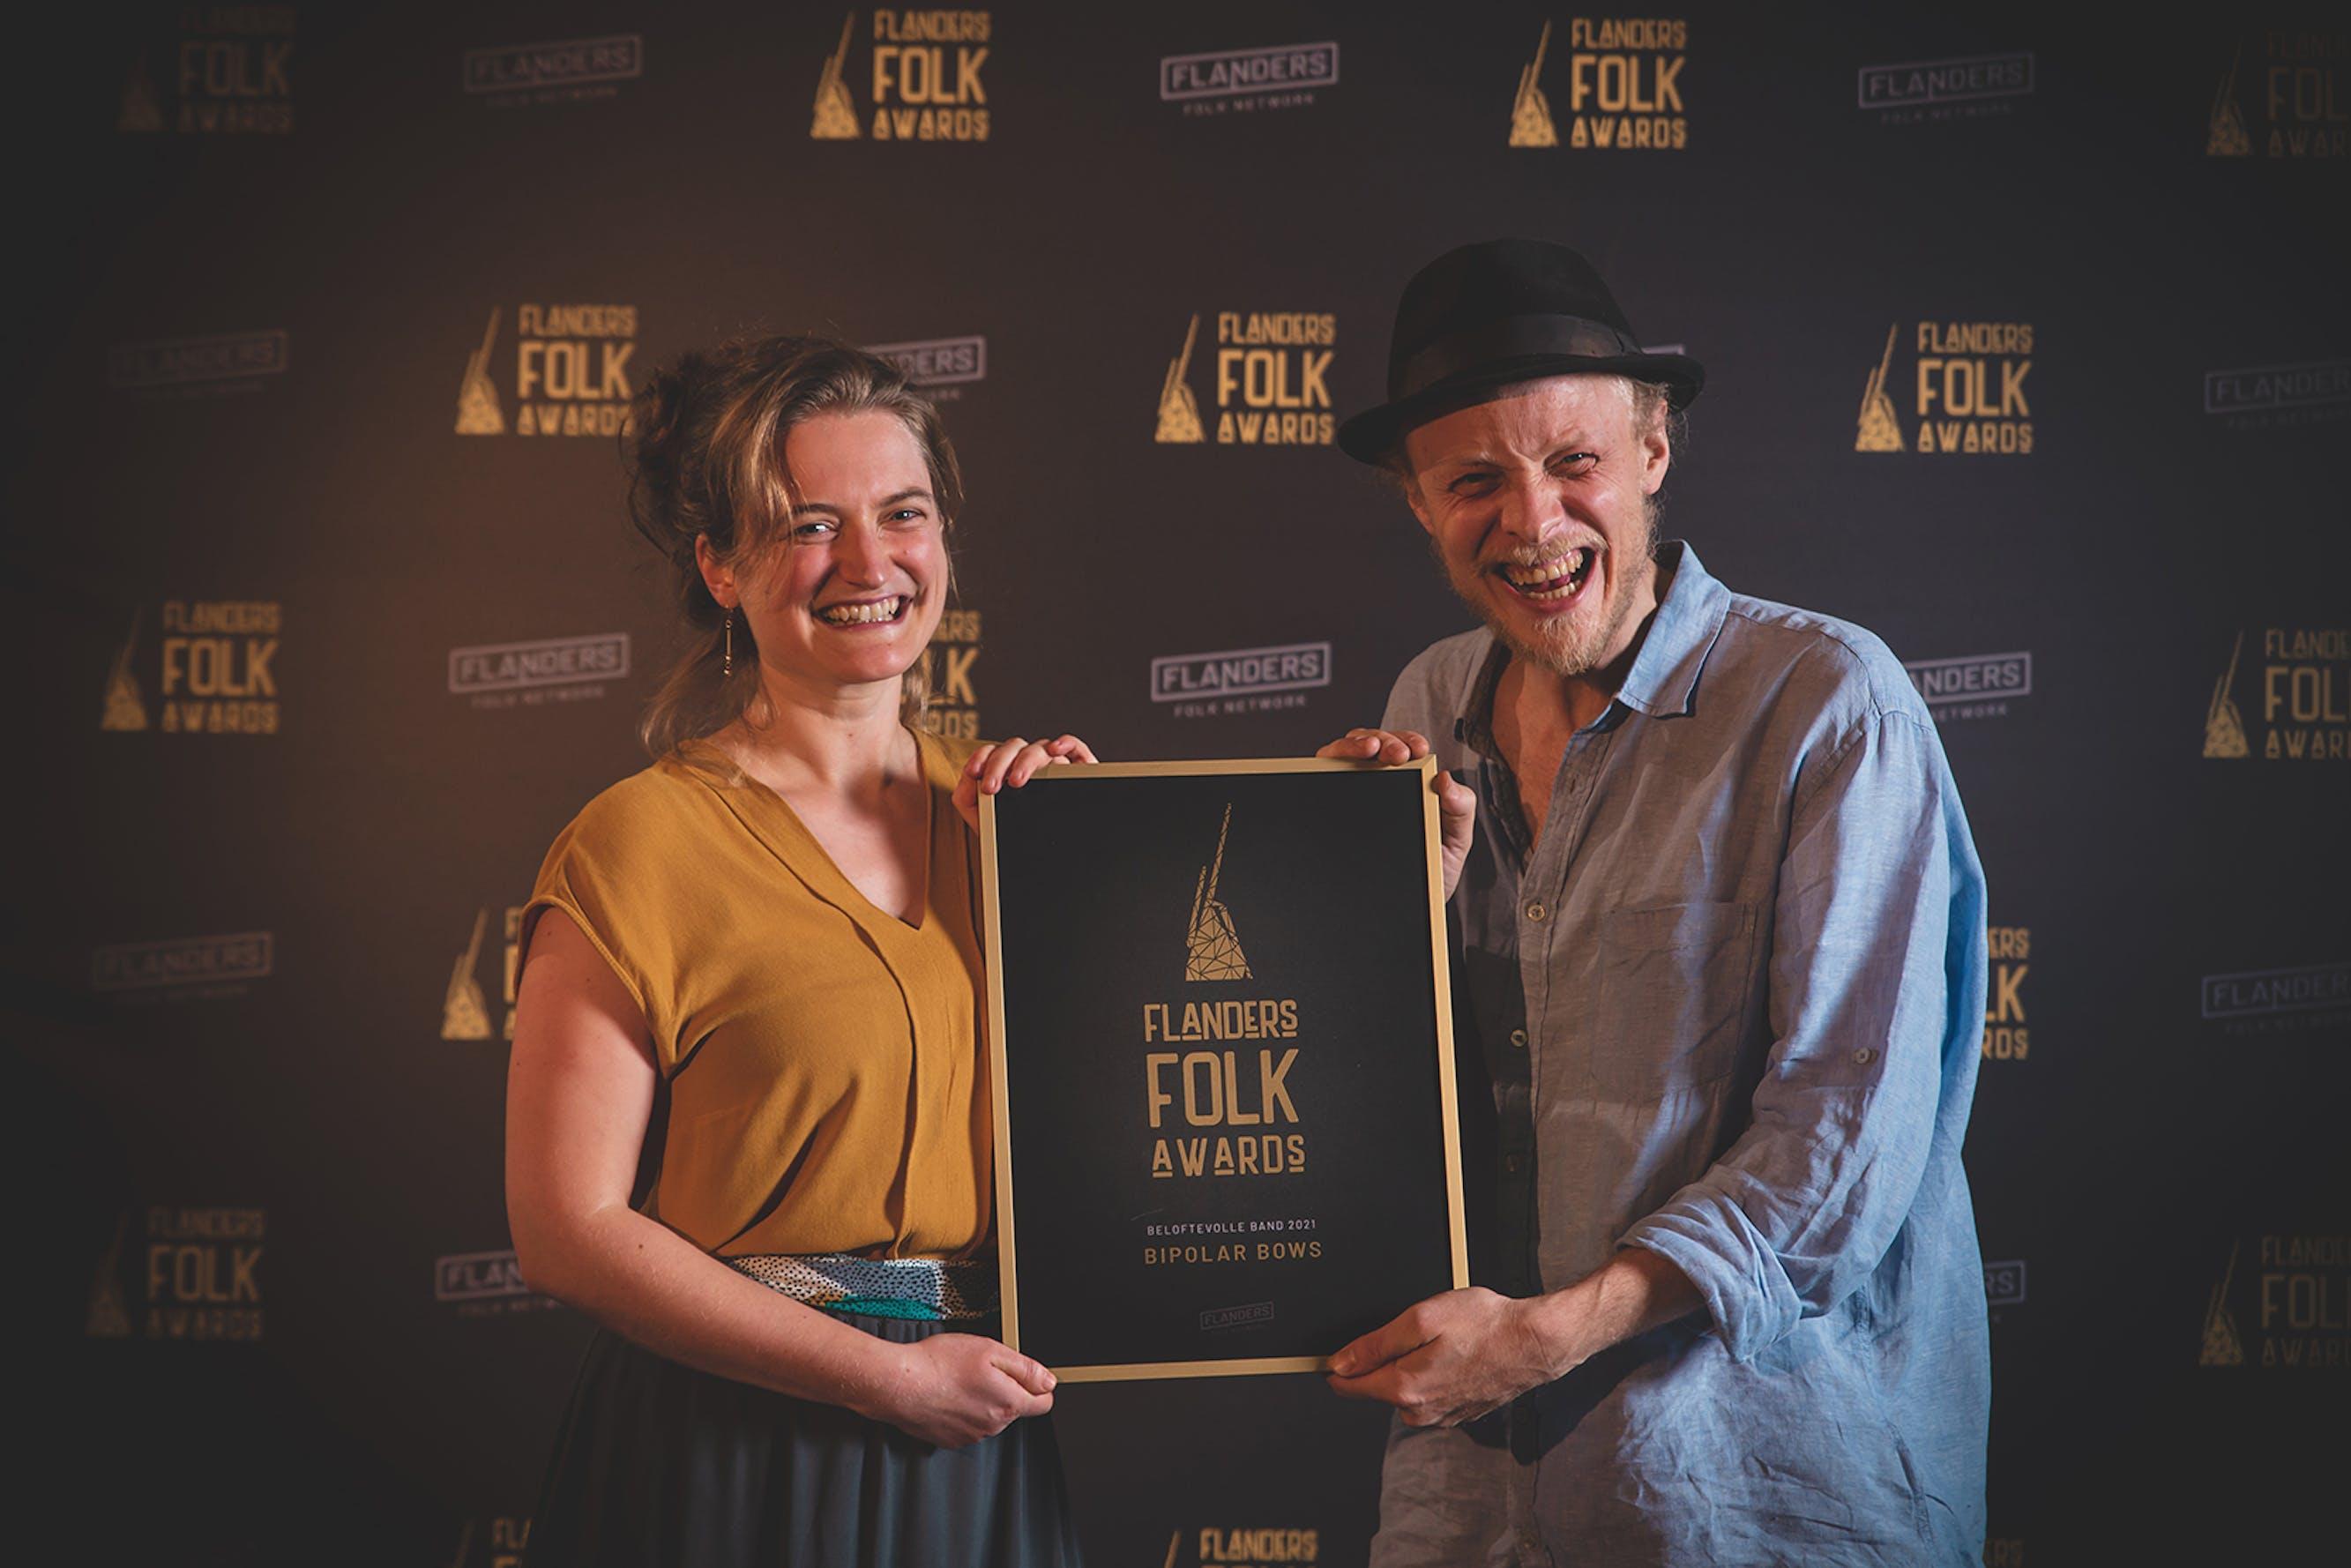 Bipolar Bows, Tom Theuns & Aurélie Dorzée en Trio Dhoore winnen Flanders Folk Awards 2021